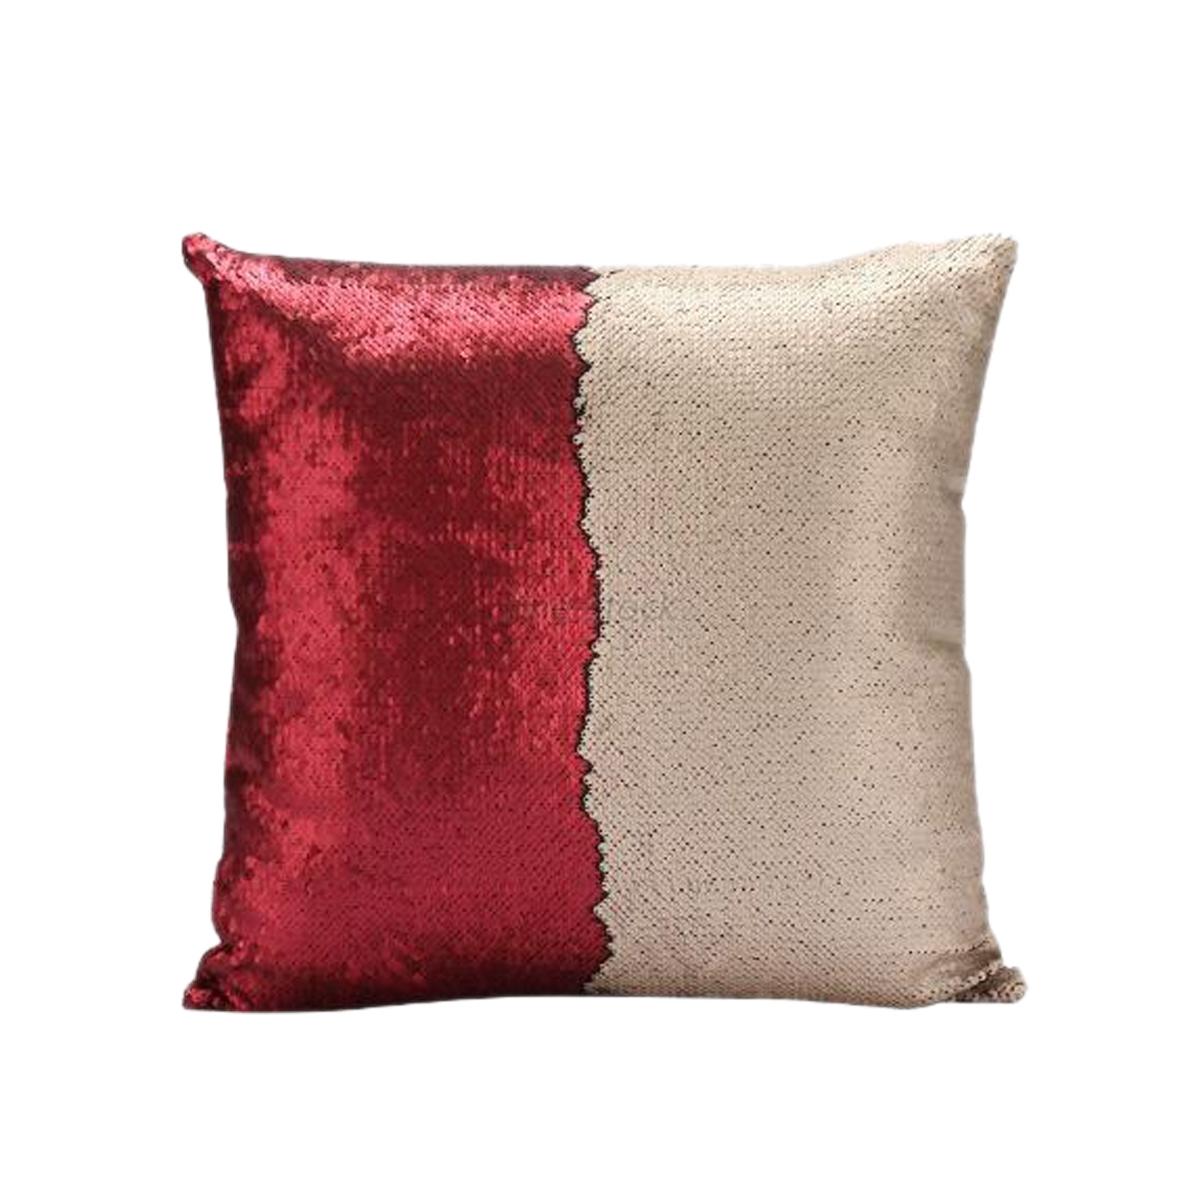 Red Champagne Mermaid Pillow  Mermaid Pillows